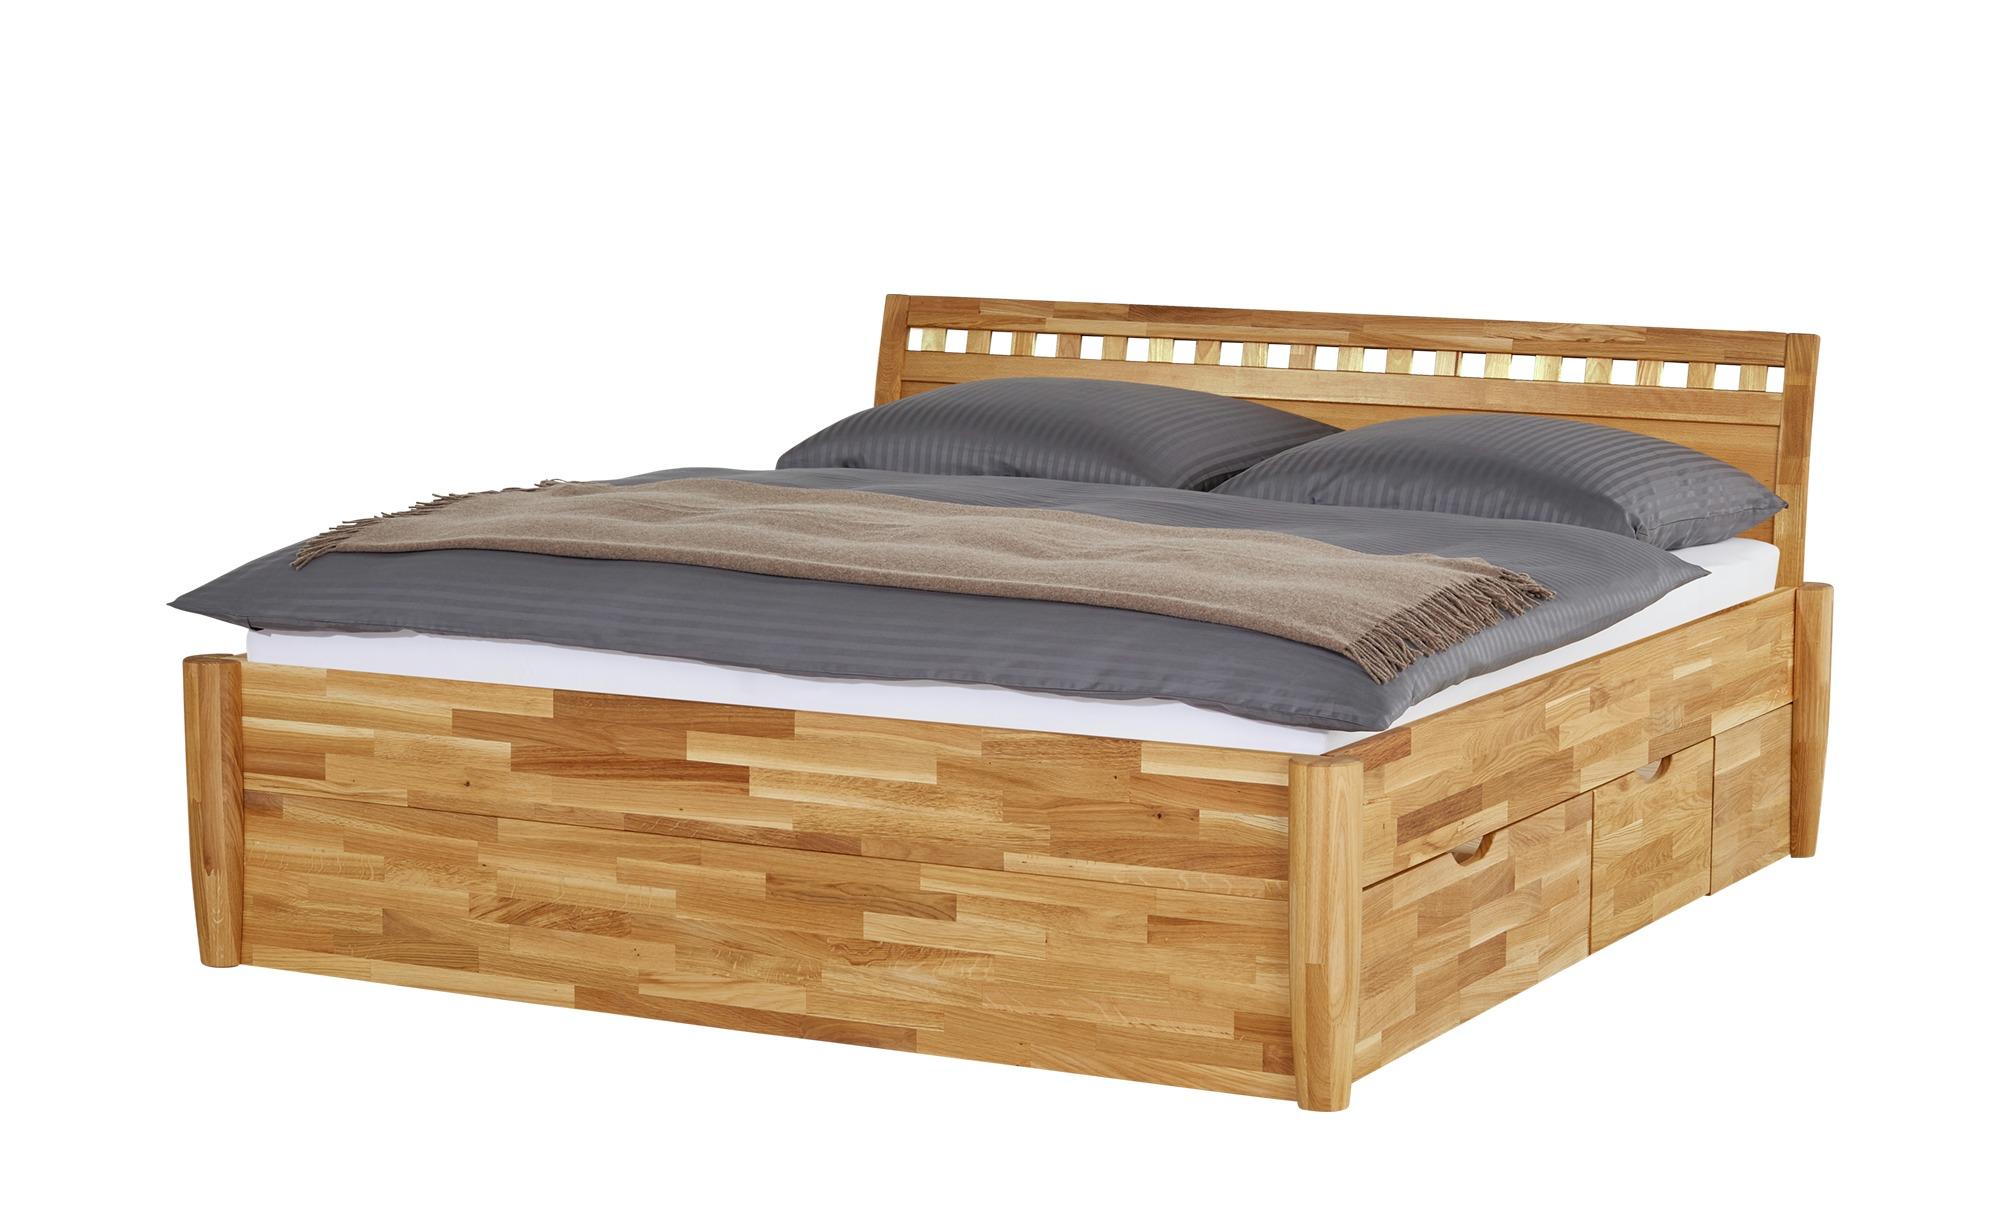 #Massivholz-Bettgestell mit Bettkasten Timber ¦ holzfarben ¦ Maße (cm): B: 176 H: 93 Betten > Futonbetten – Höffner#